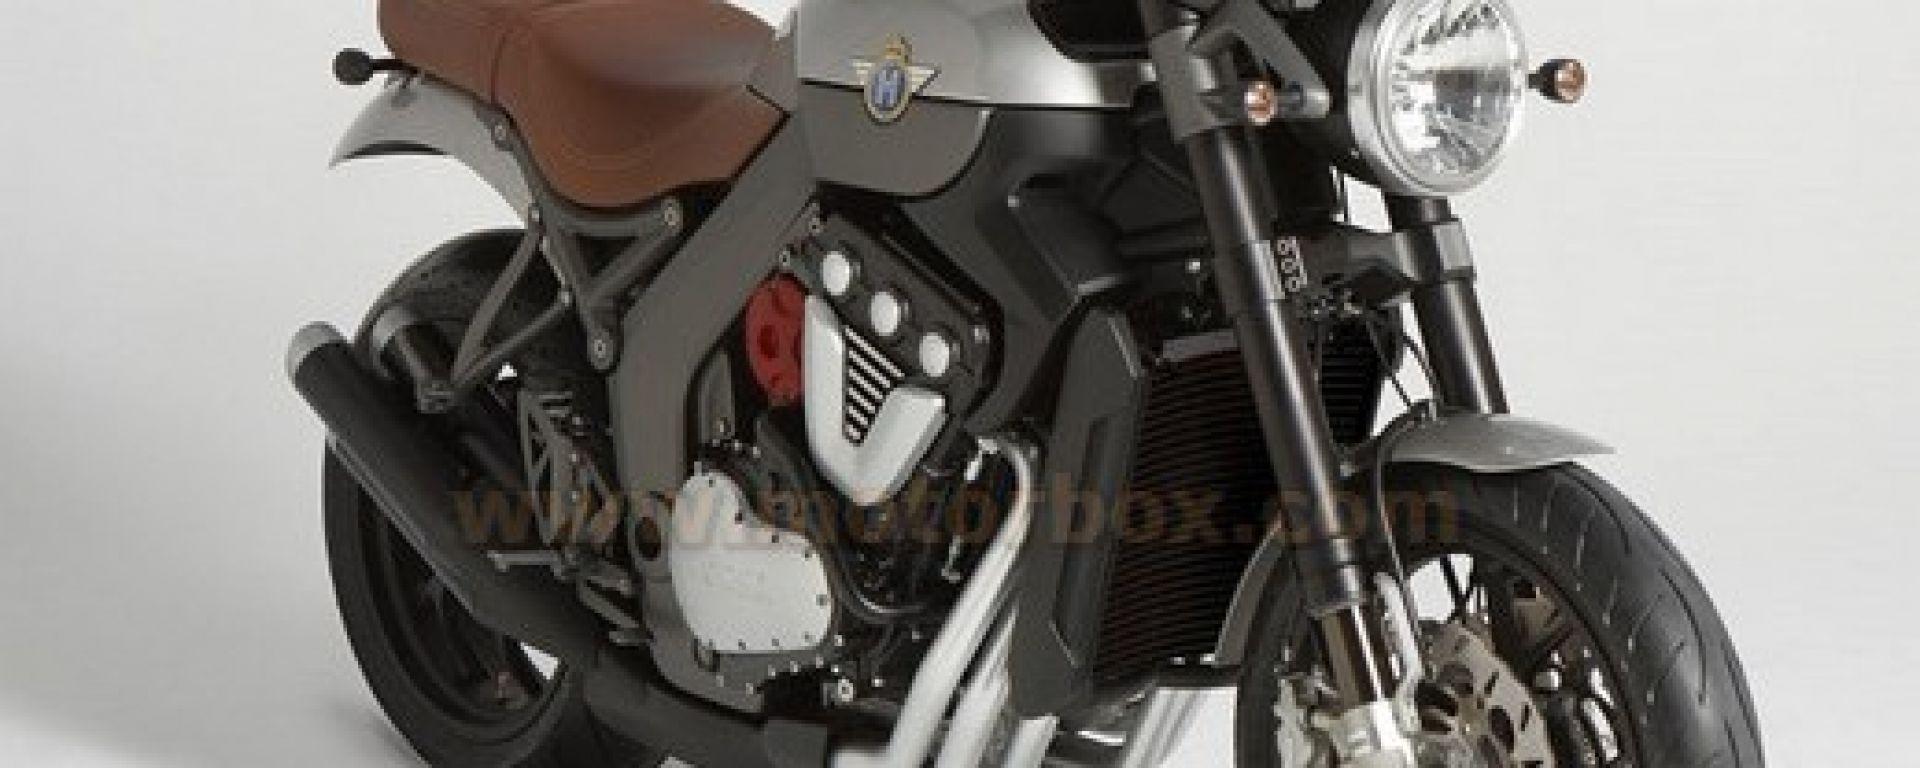 Horex VR6 Roadster